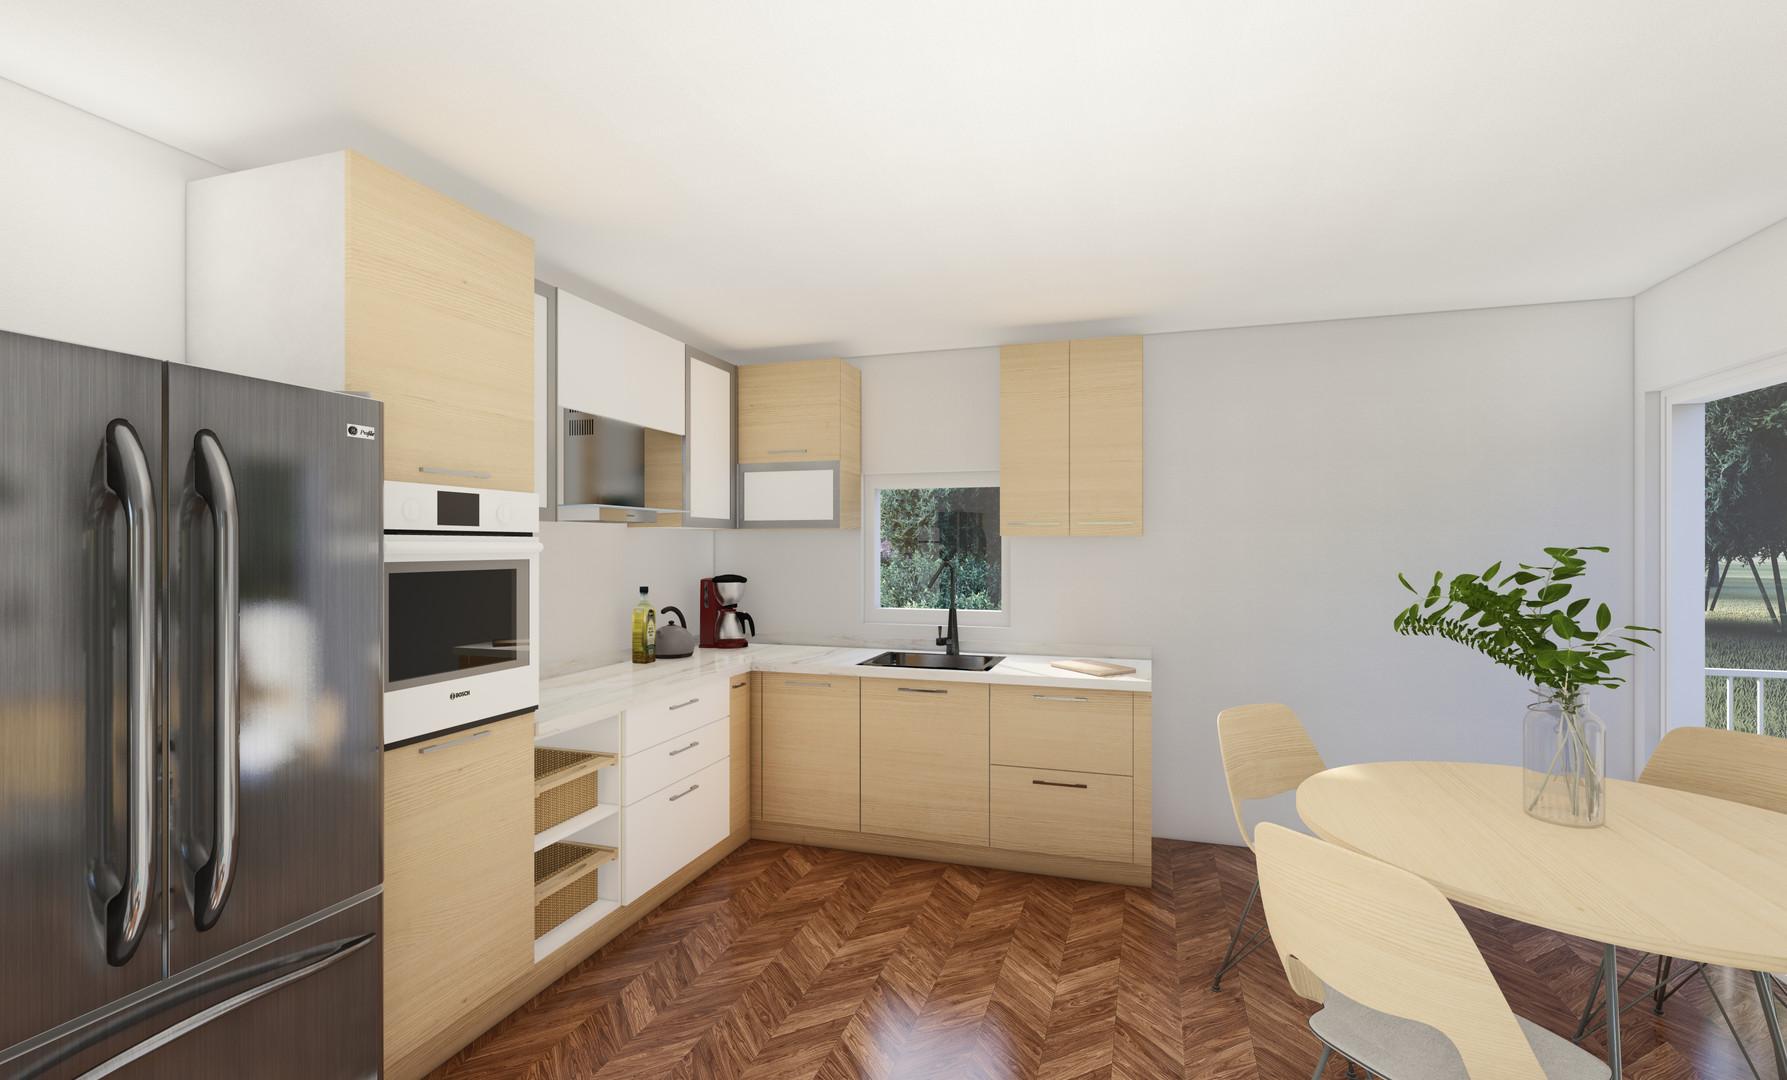 Mockupfirst floor kitchen.jpg